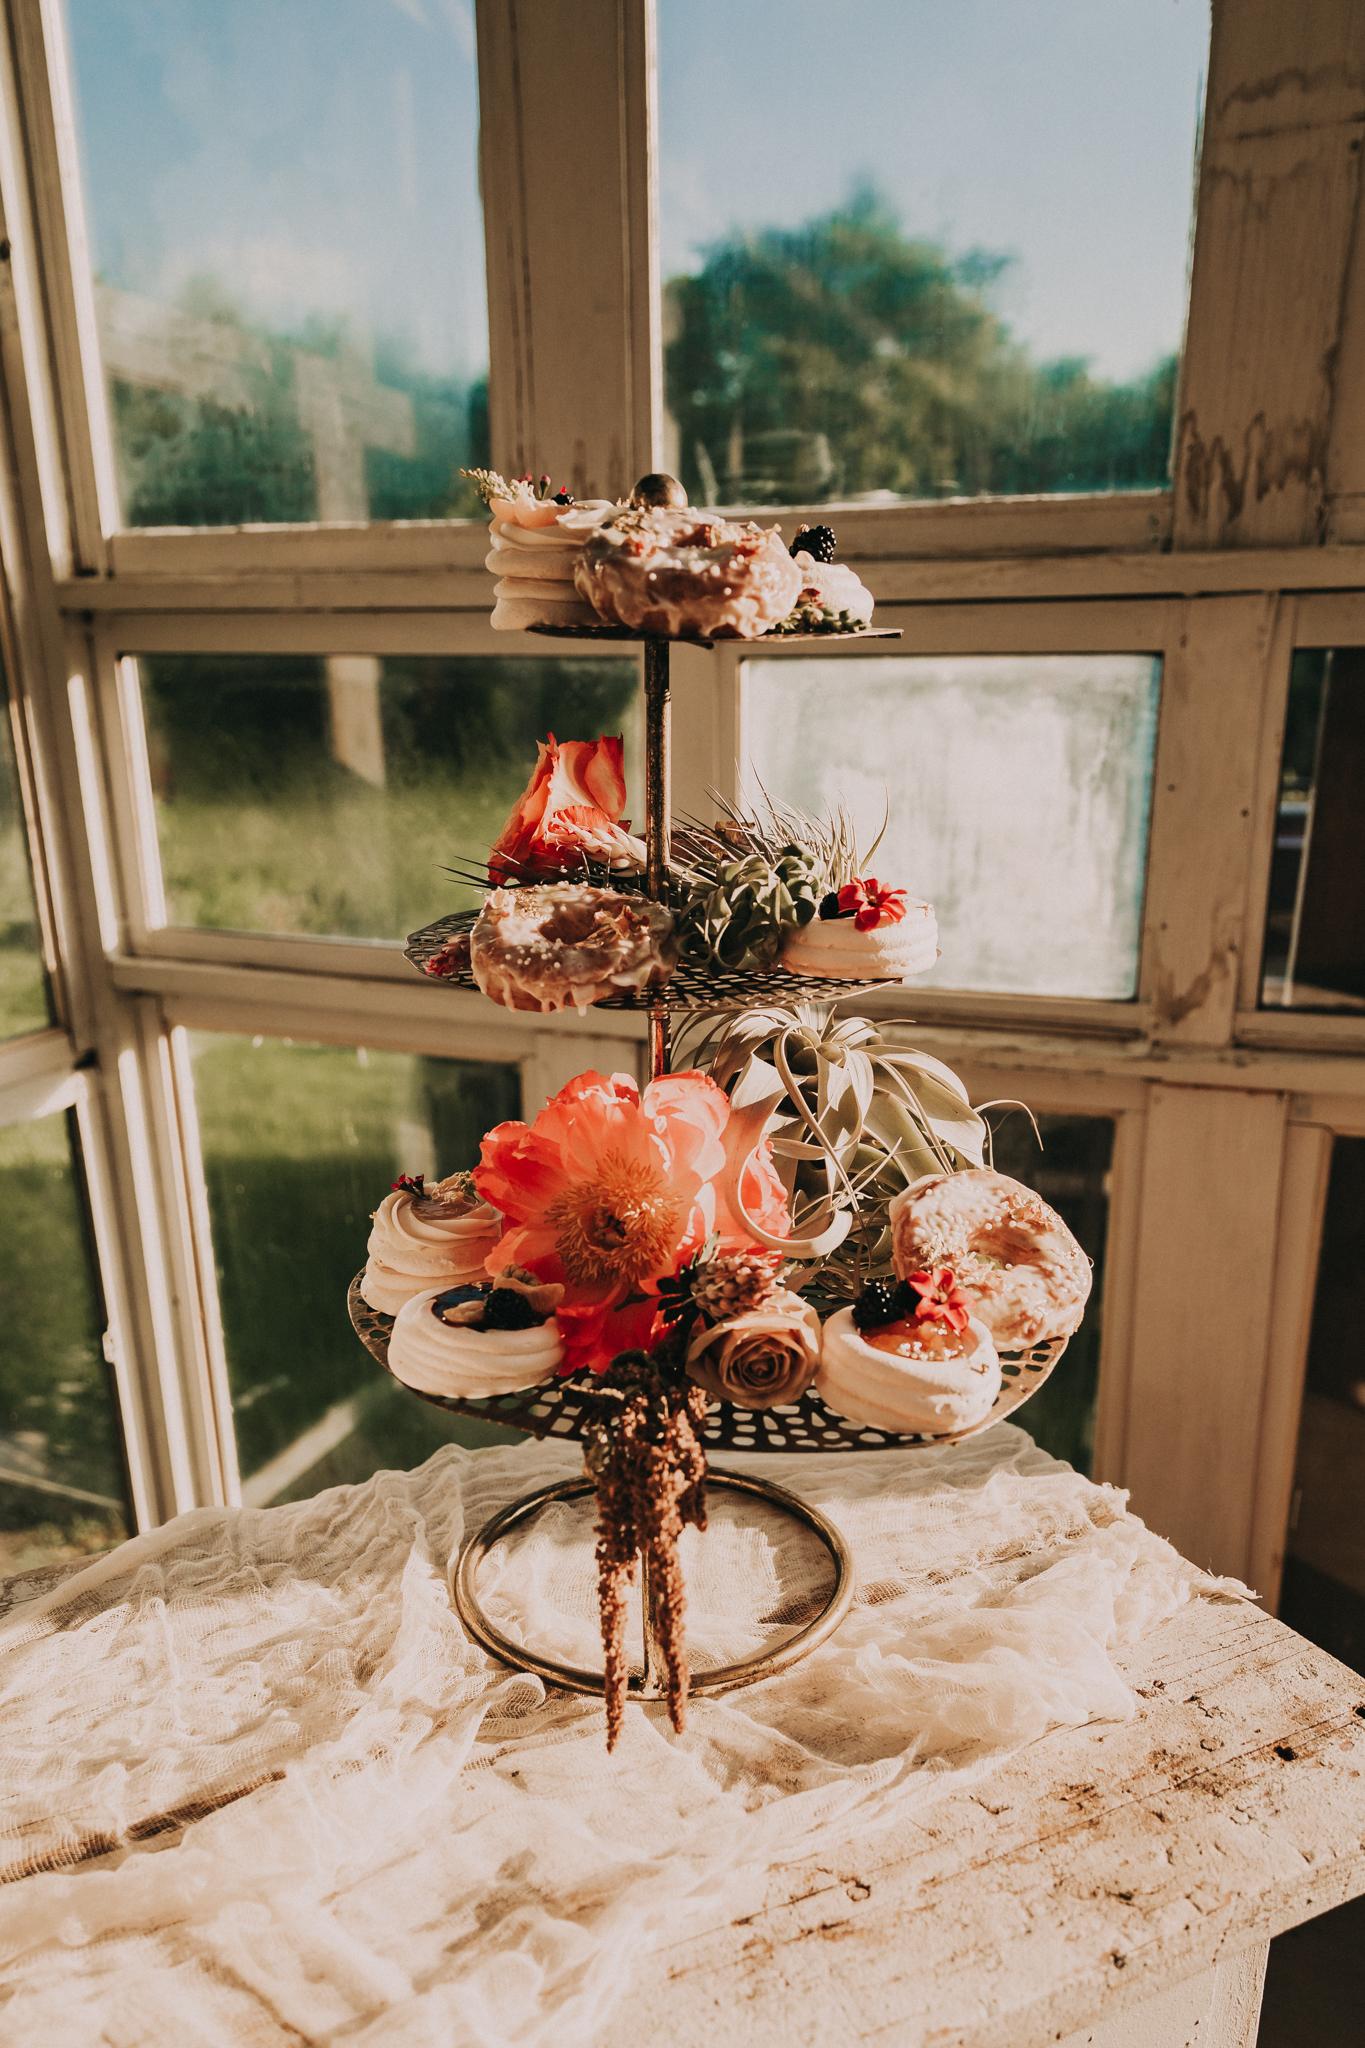 Dessert ideas: Flower Farm Styled Shoot by Billie-Shaye Style featured on Nashville Bride Guide